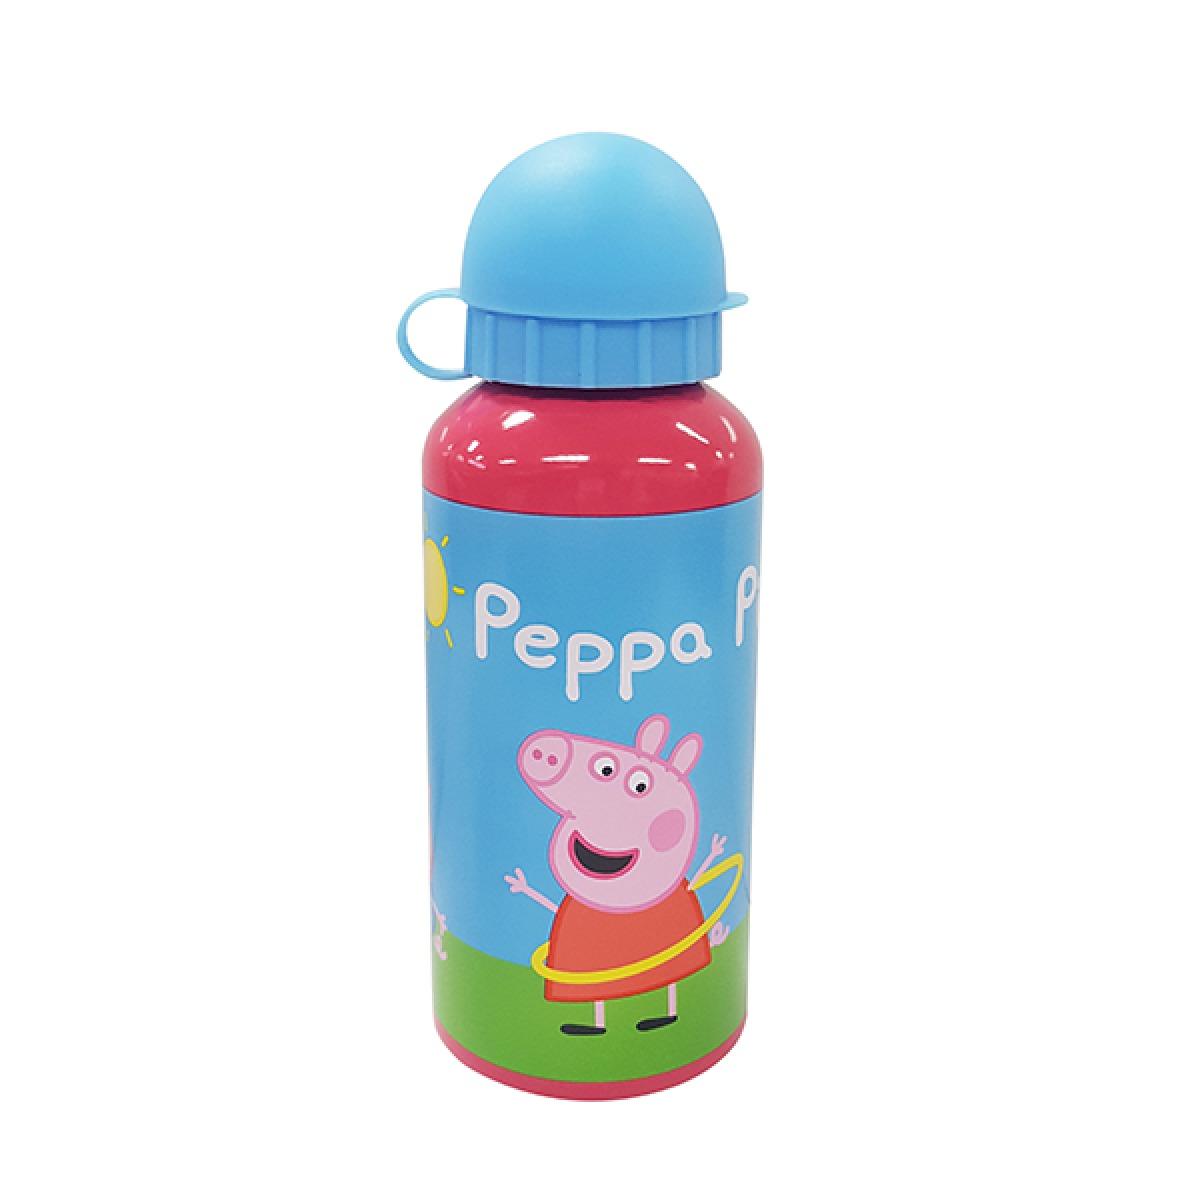 Peppa Pig Aluminium Drink Bottle image